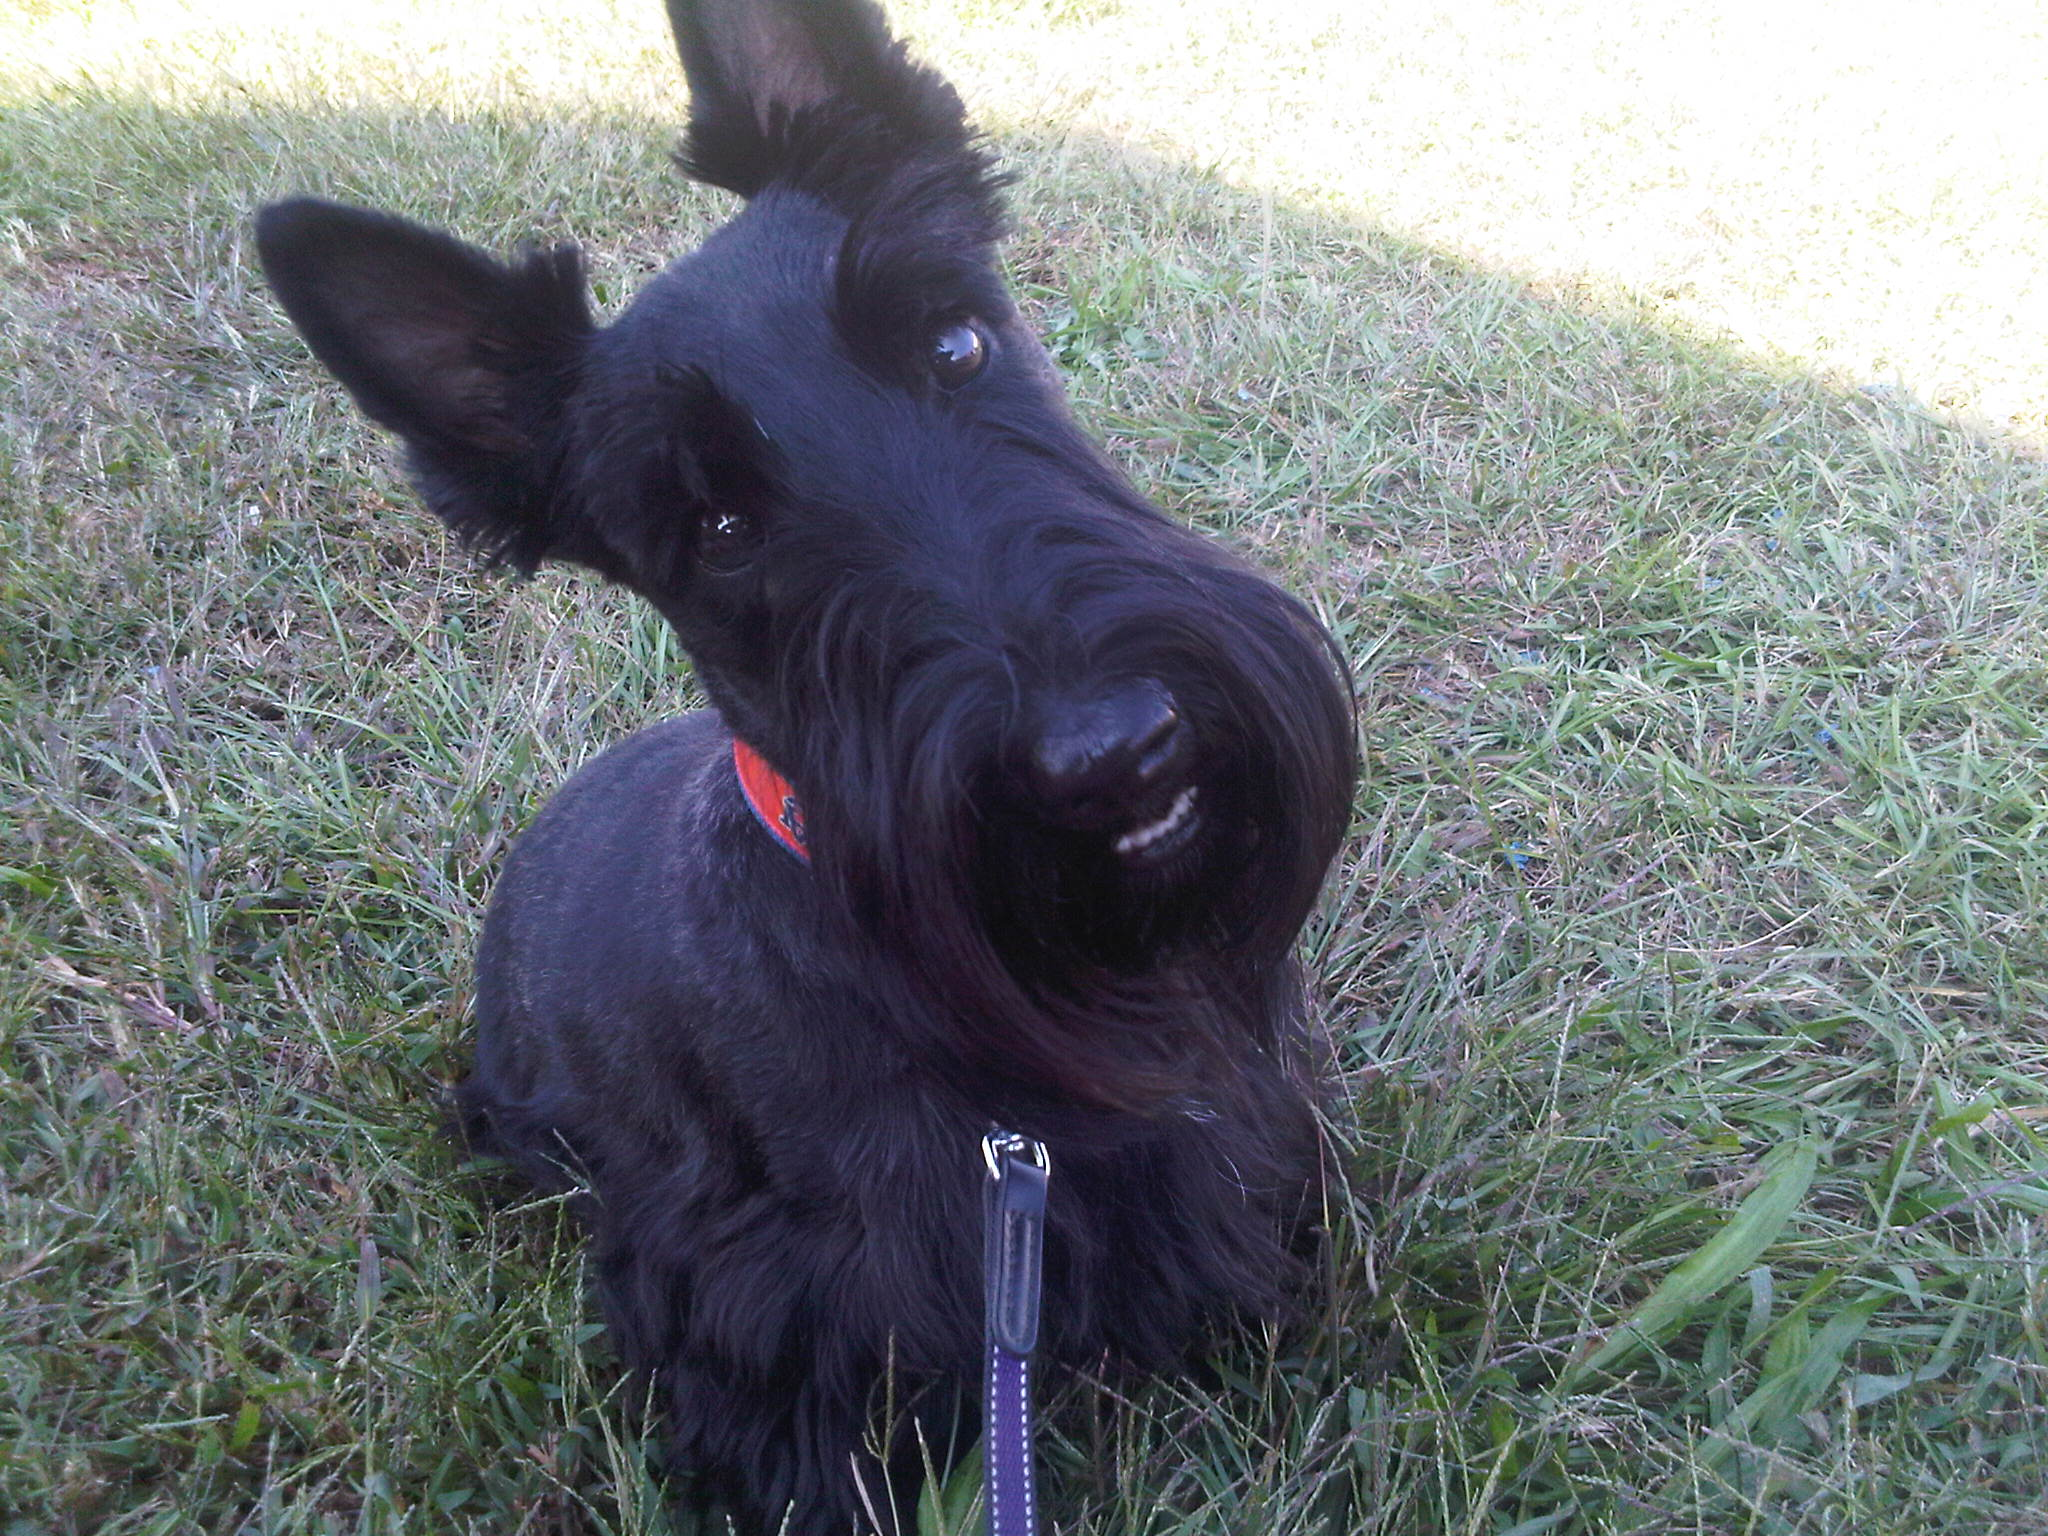 Scottish Terrier Dog: Scottish Funny Scottish Terrier Dog Face Breed